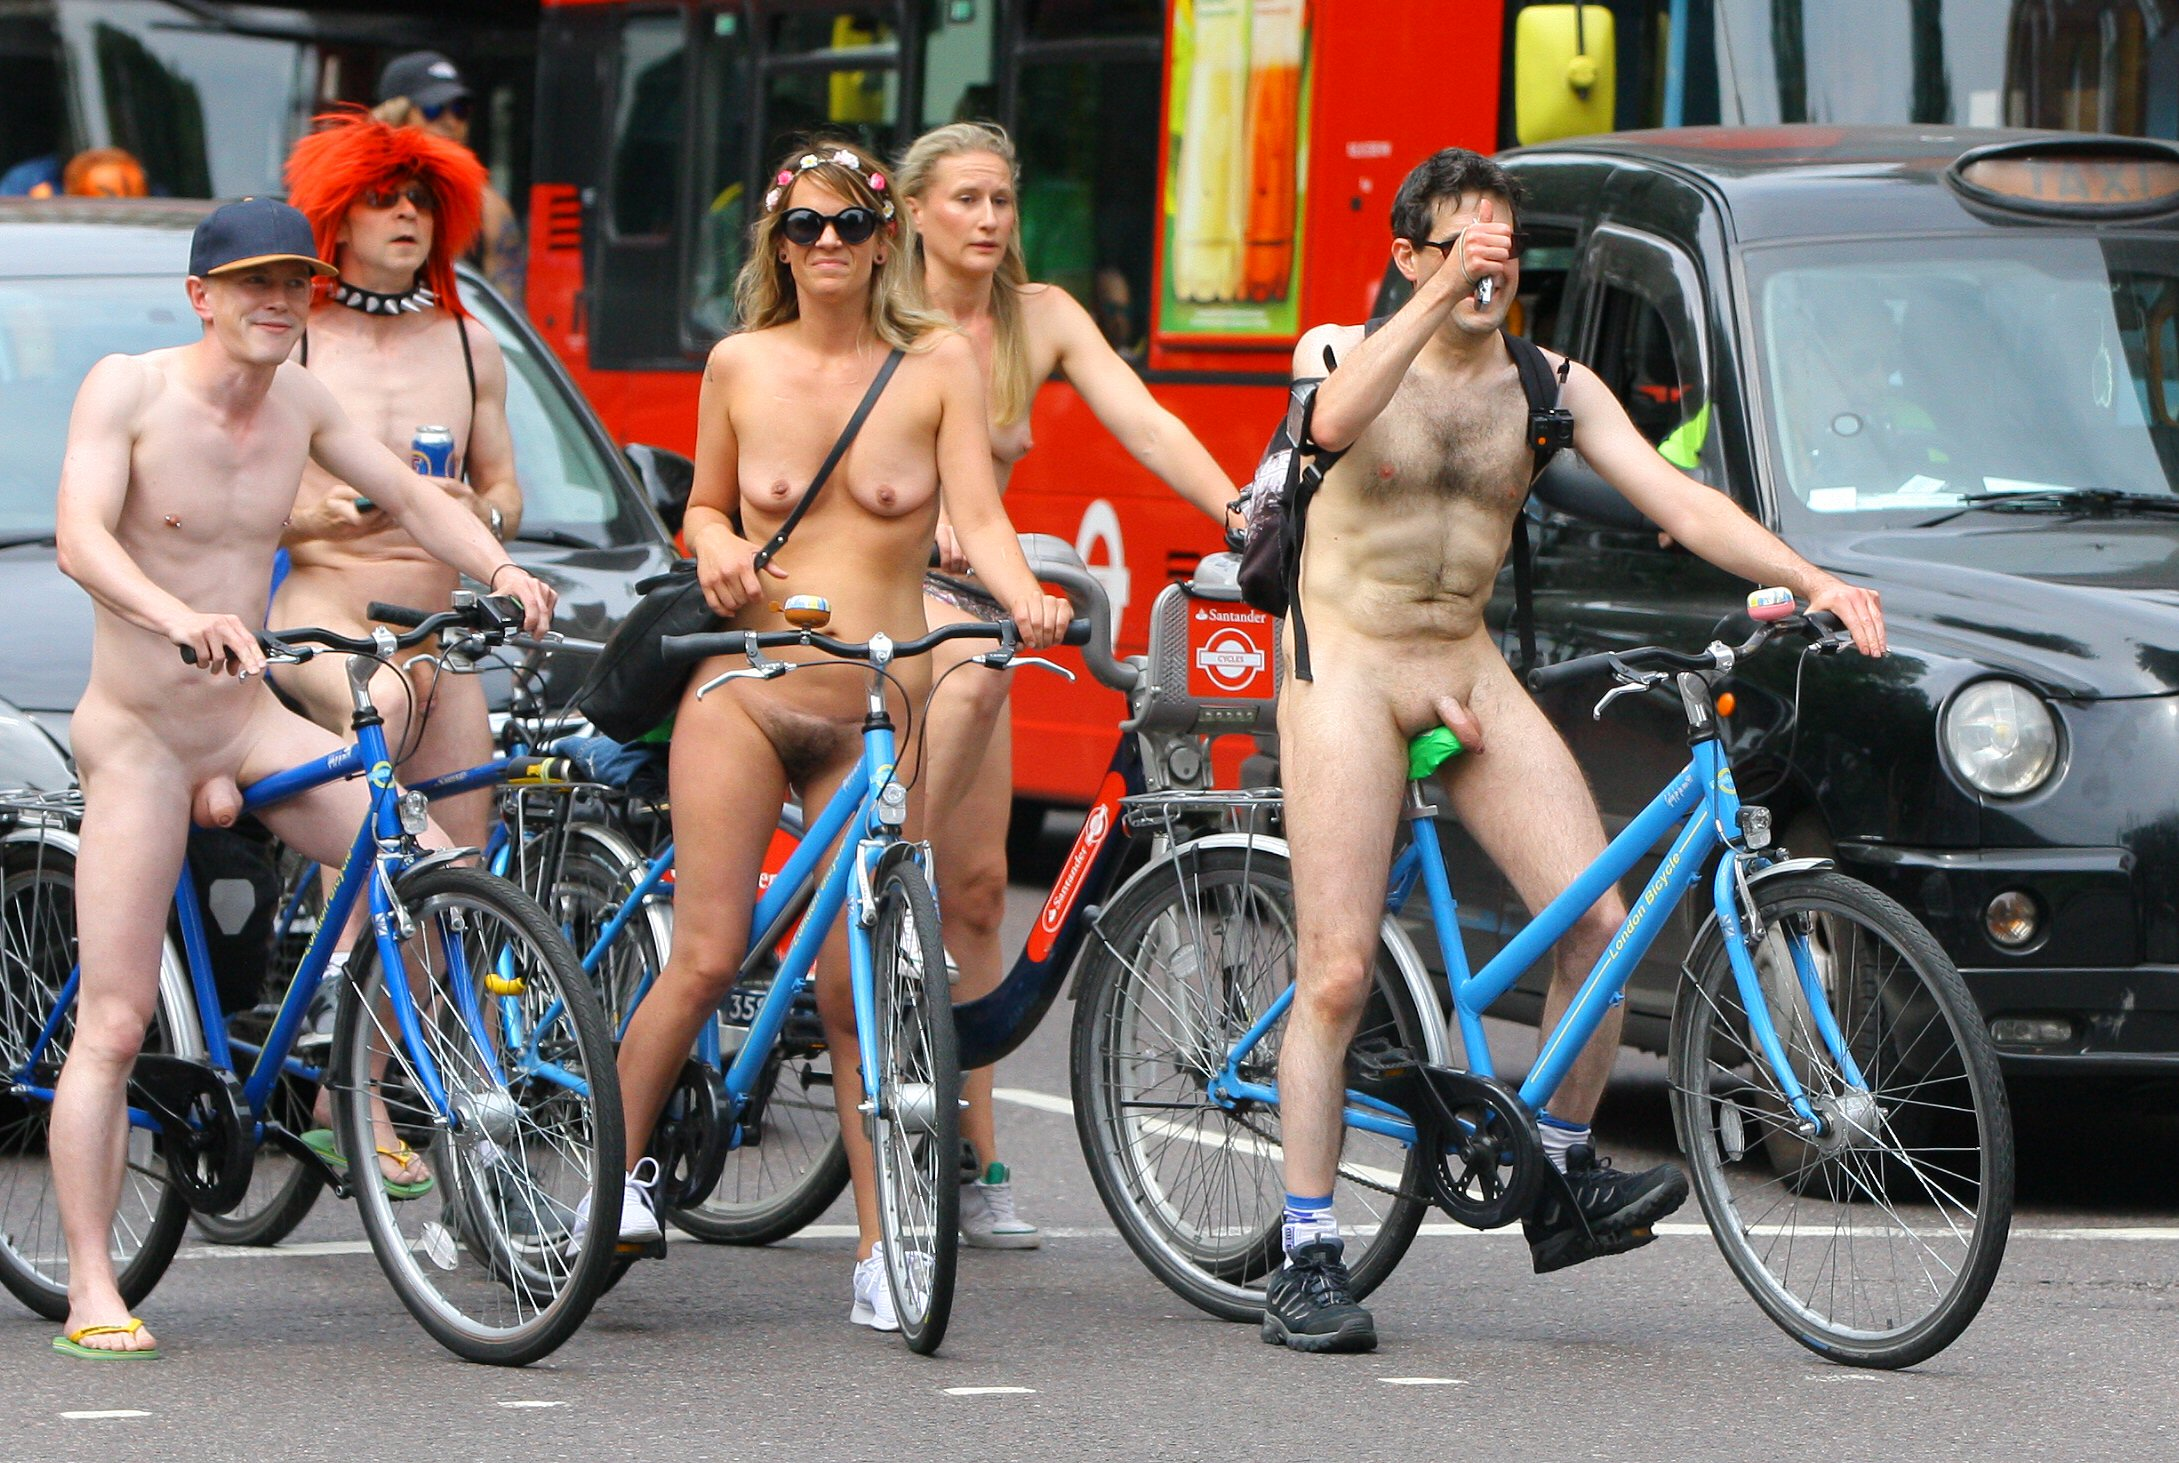 London naked bike ride 2018